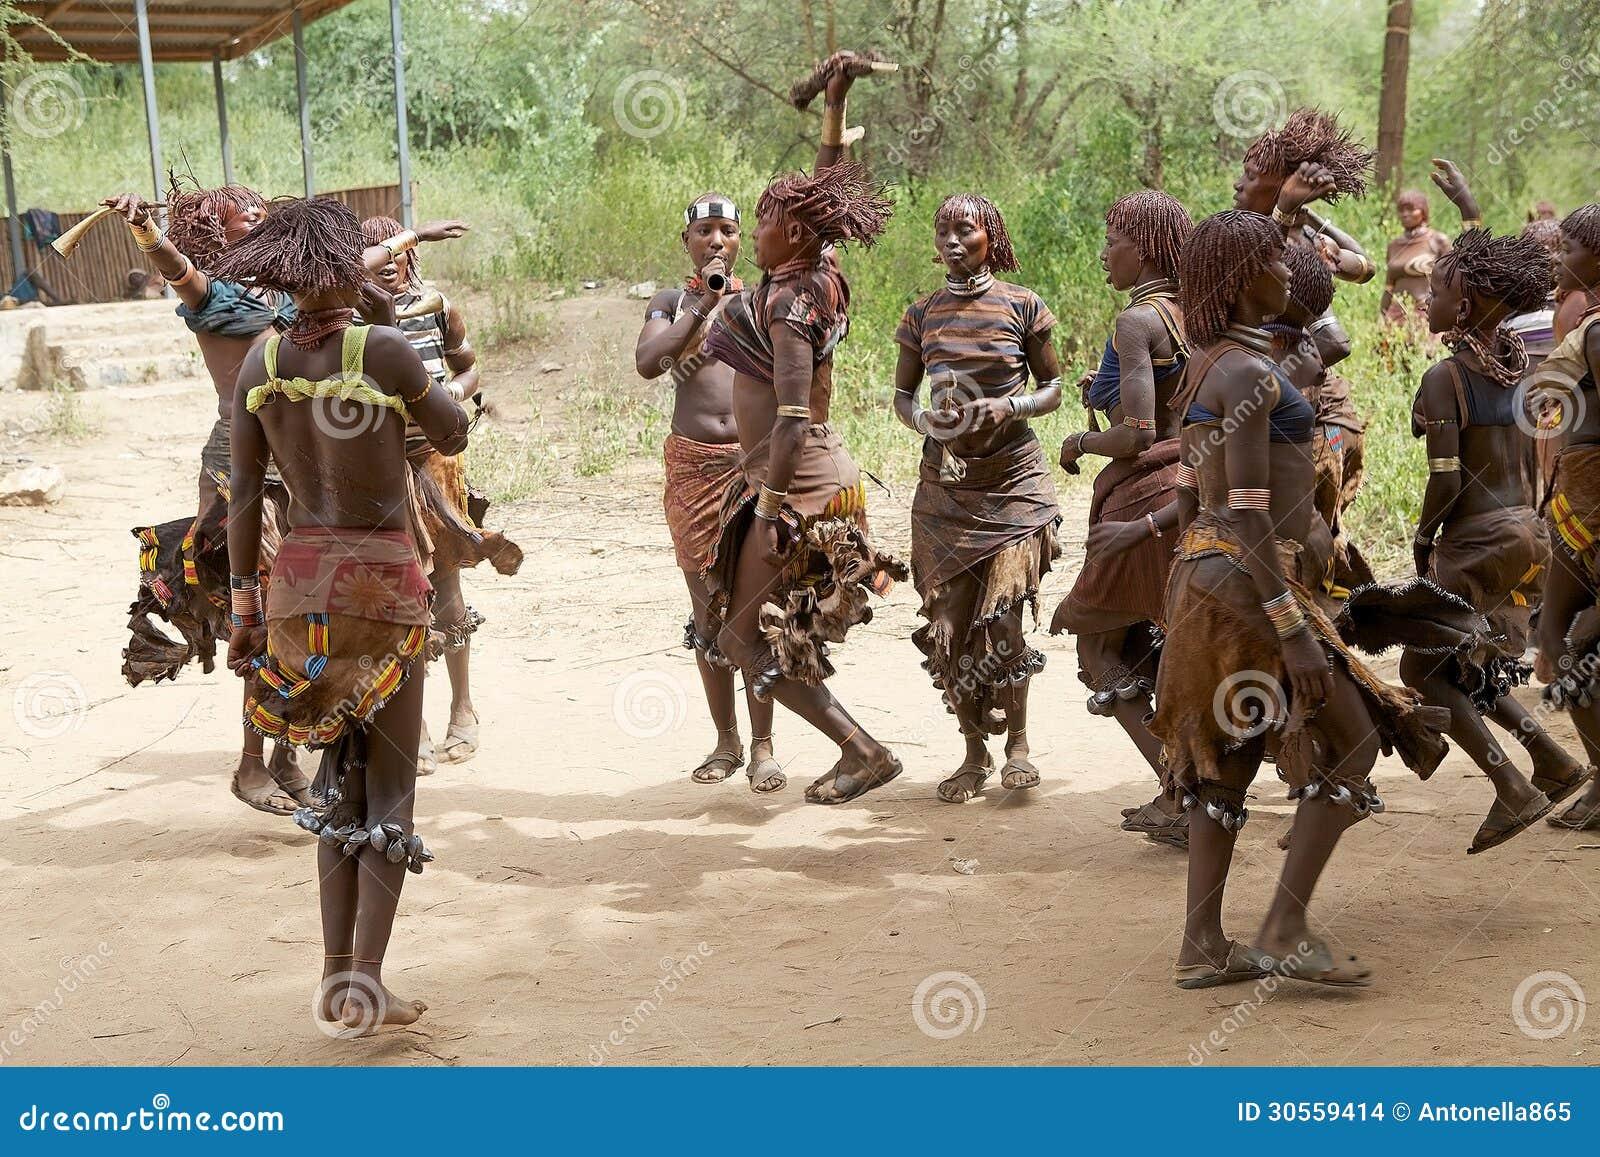 Ragazze africane nude picture 440